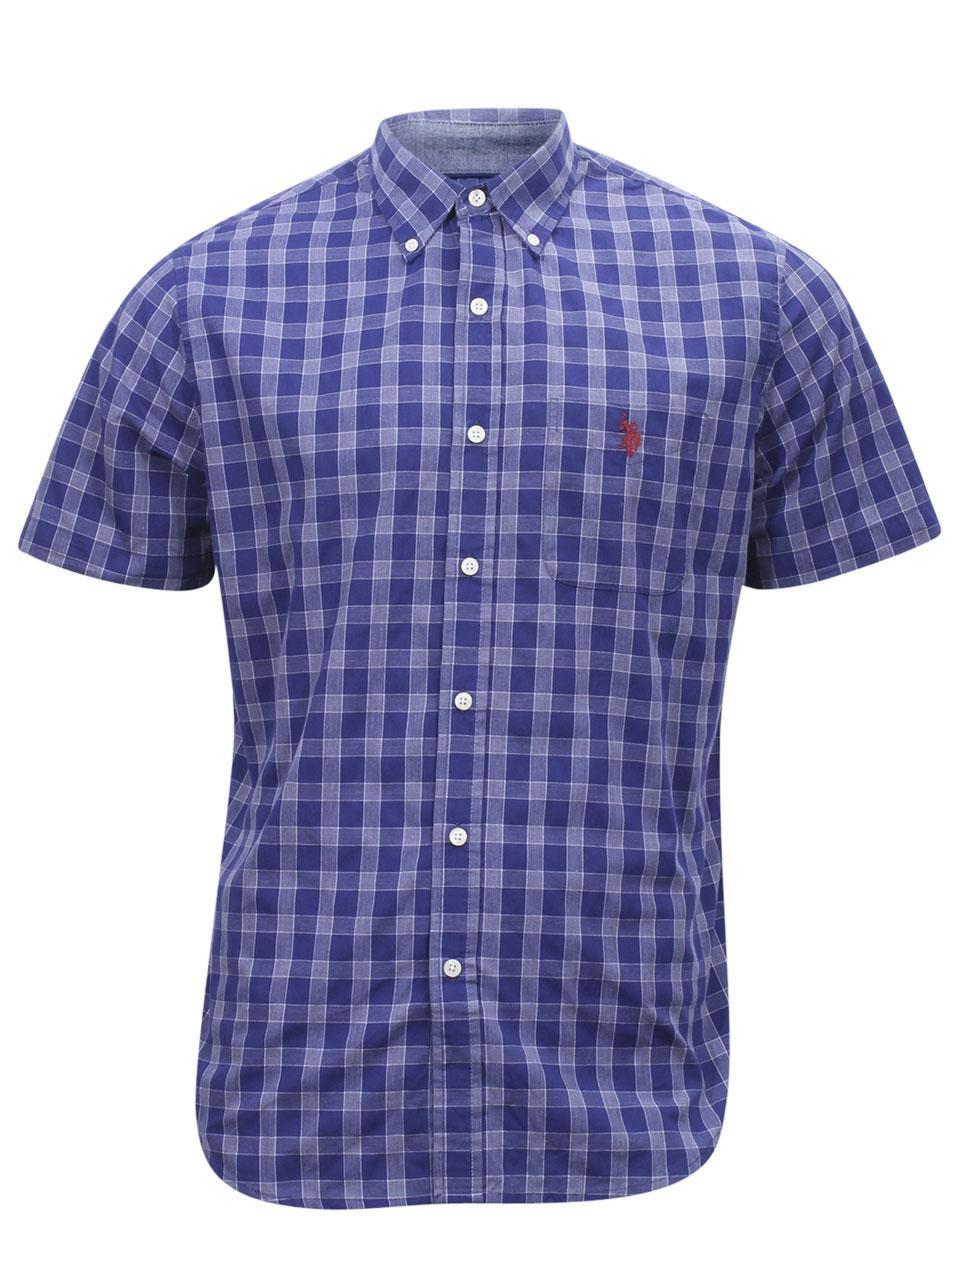 697a26cf5 U.S. Polo Association Men s Short Sleeve Check Plaid Button Down Shirt